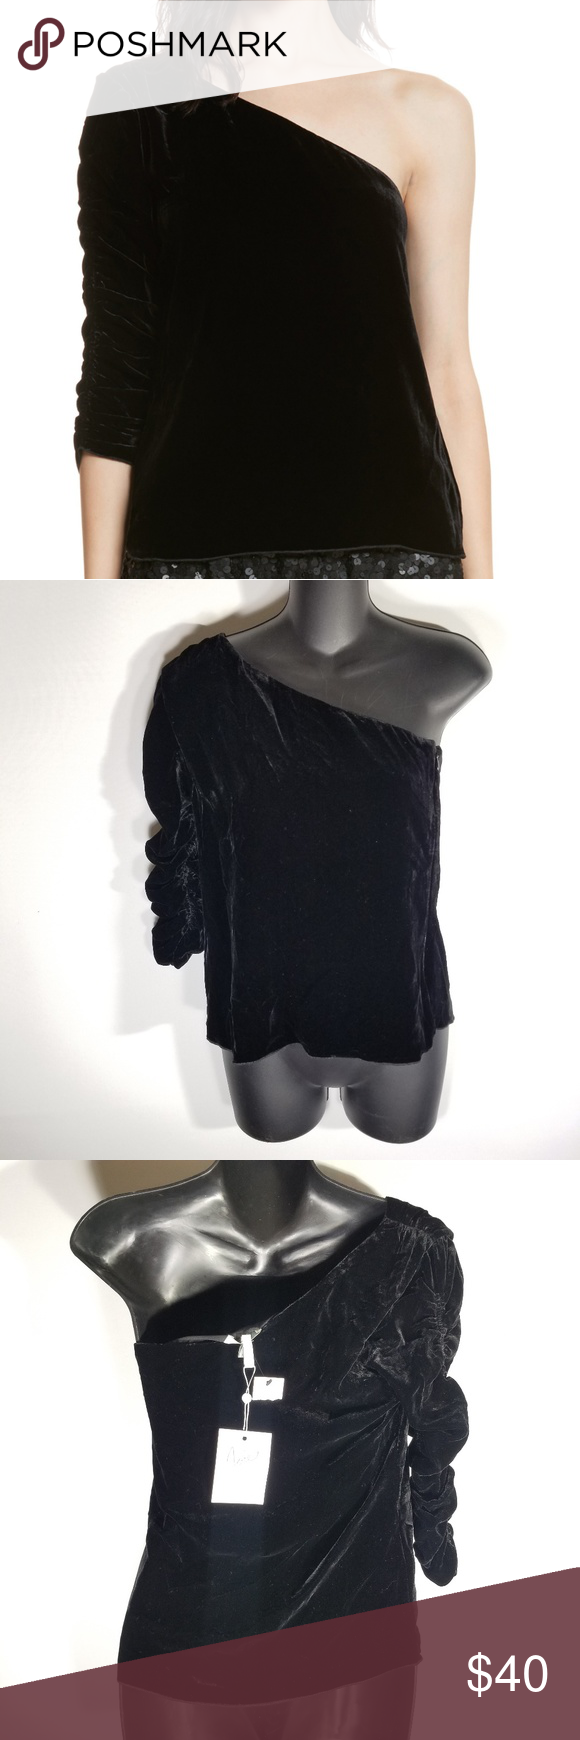 78b0e3c24cd90f NWT Joie Wayman Black Velvet One Shoulder Top New with tags. One shoulder  neckline